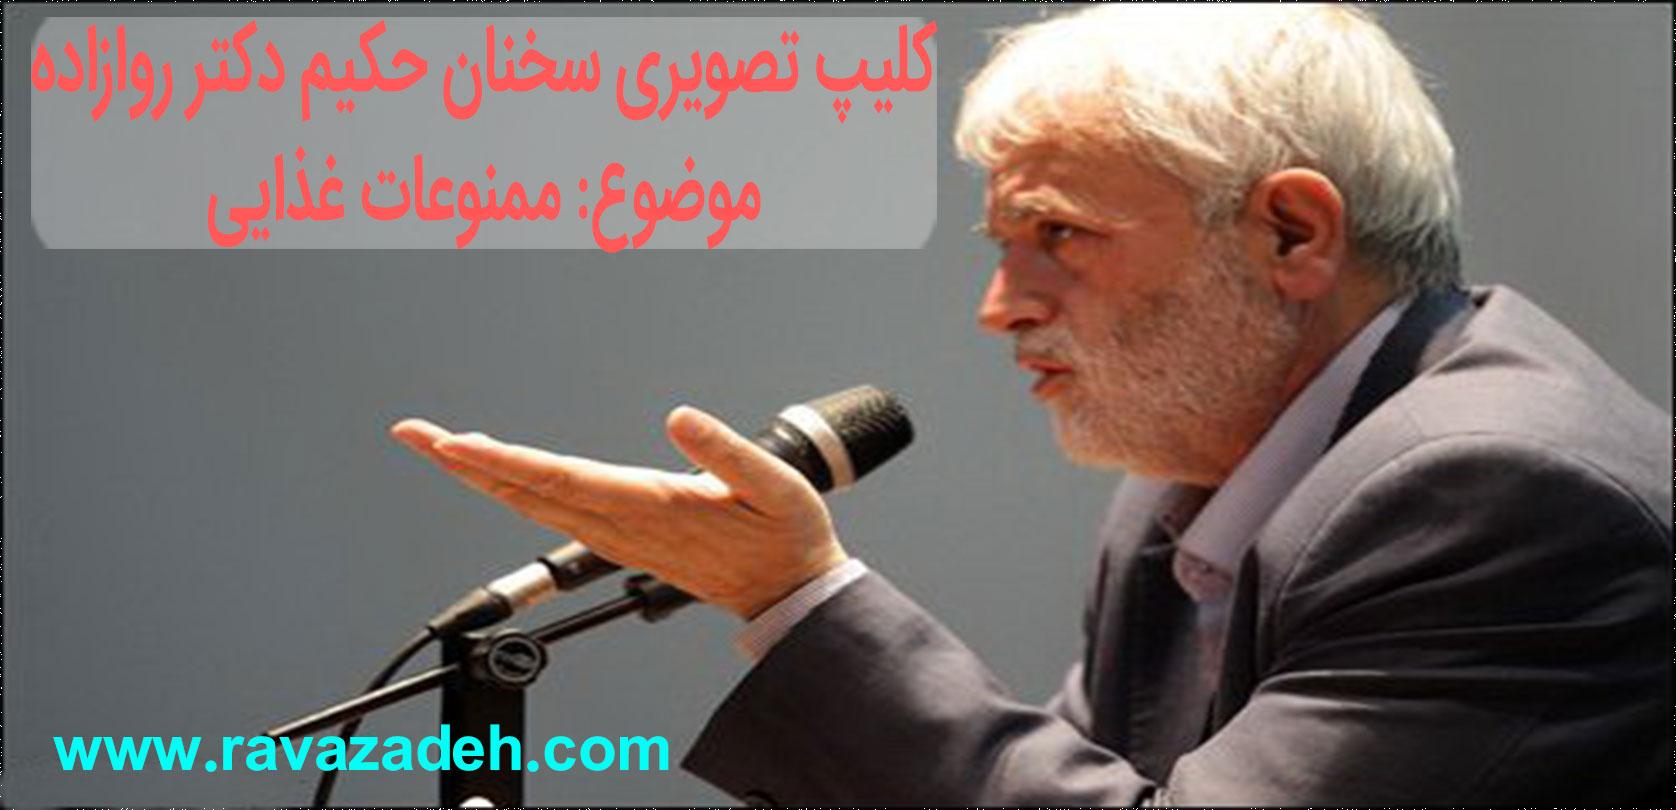 Photo of ممنوعات غذایی + کلیپ تصویری سخنرانی حکیم دکتر روازاده